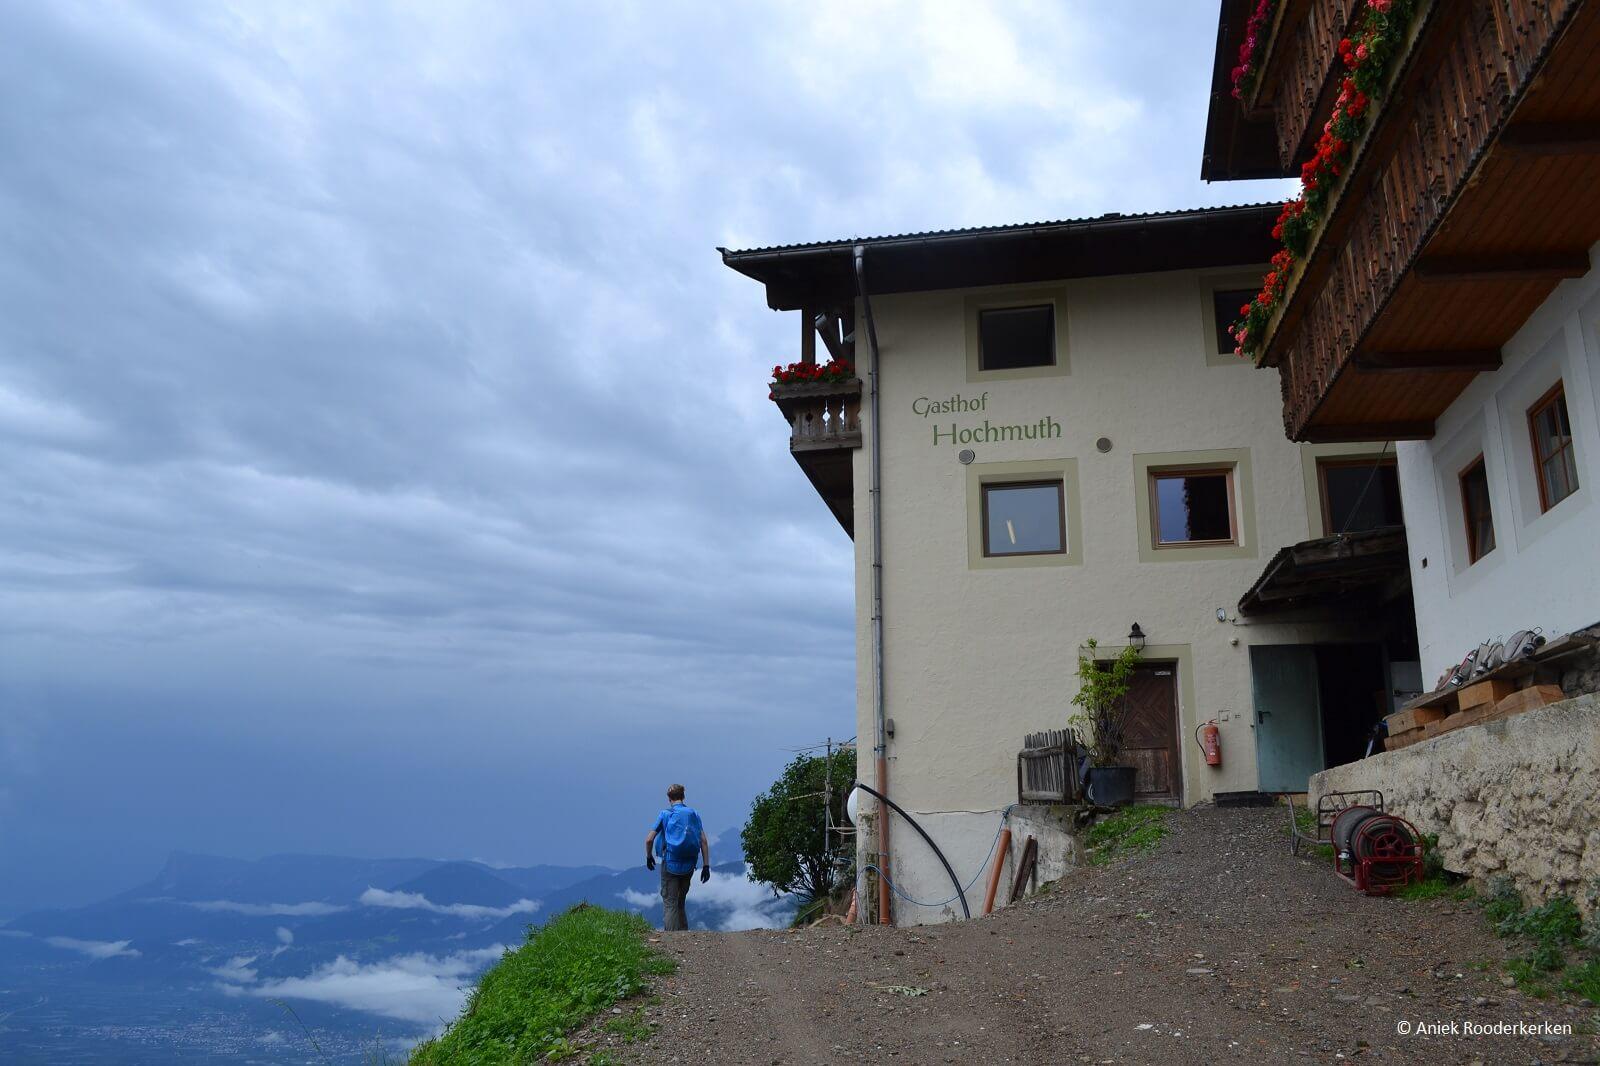 Gasthof Hochmuth aan de Alta Via di Merano, Zuid-Tirol, Italië